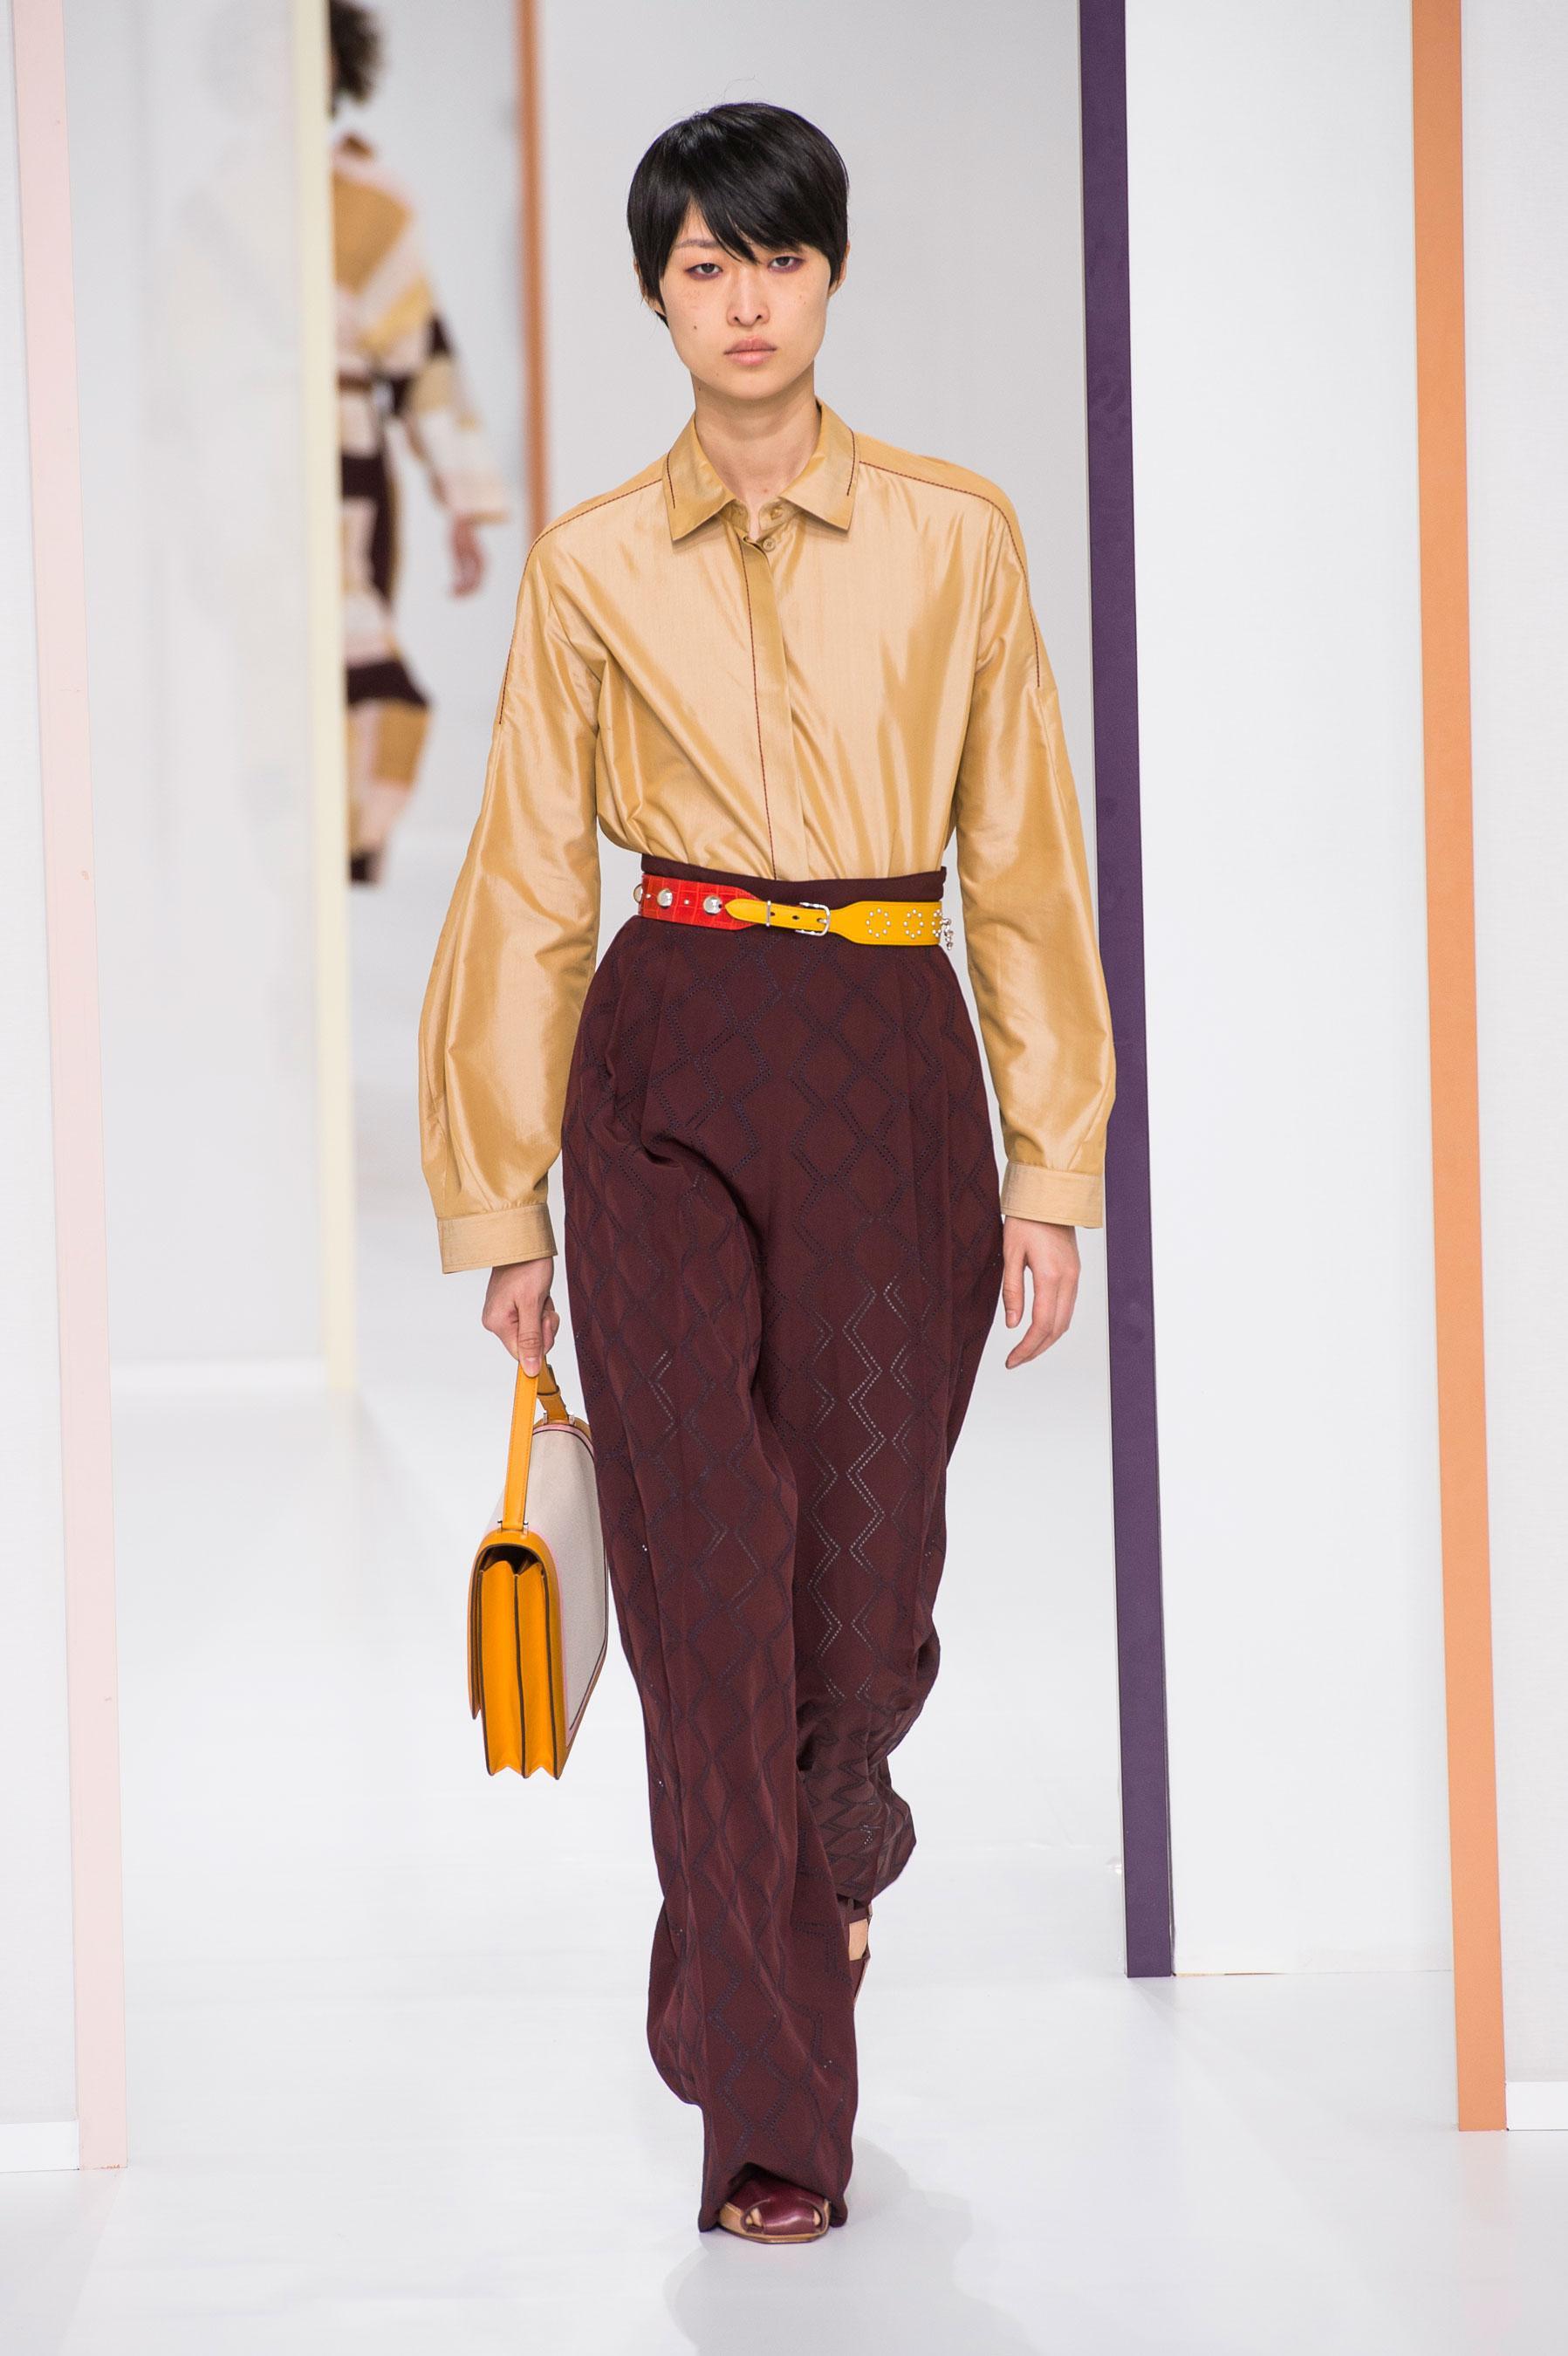 Défilé Hermès printemps-été 2018 Prêt-à-porter - Madame Figaro ae969c1f401